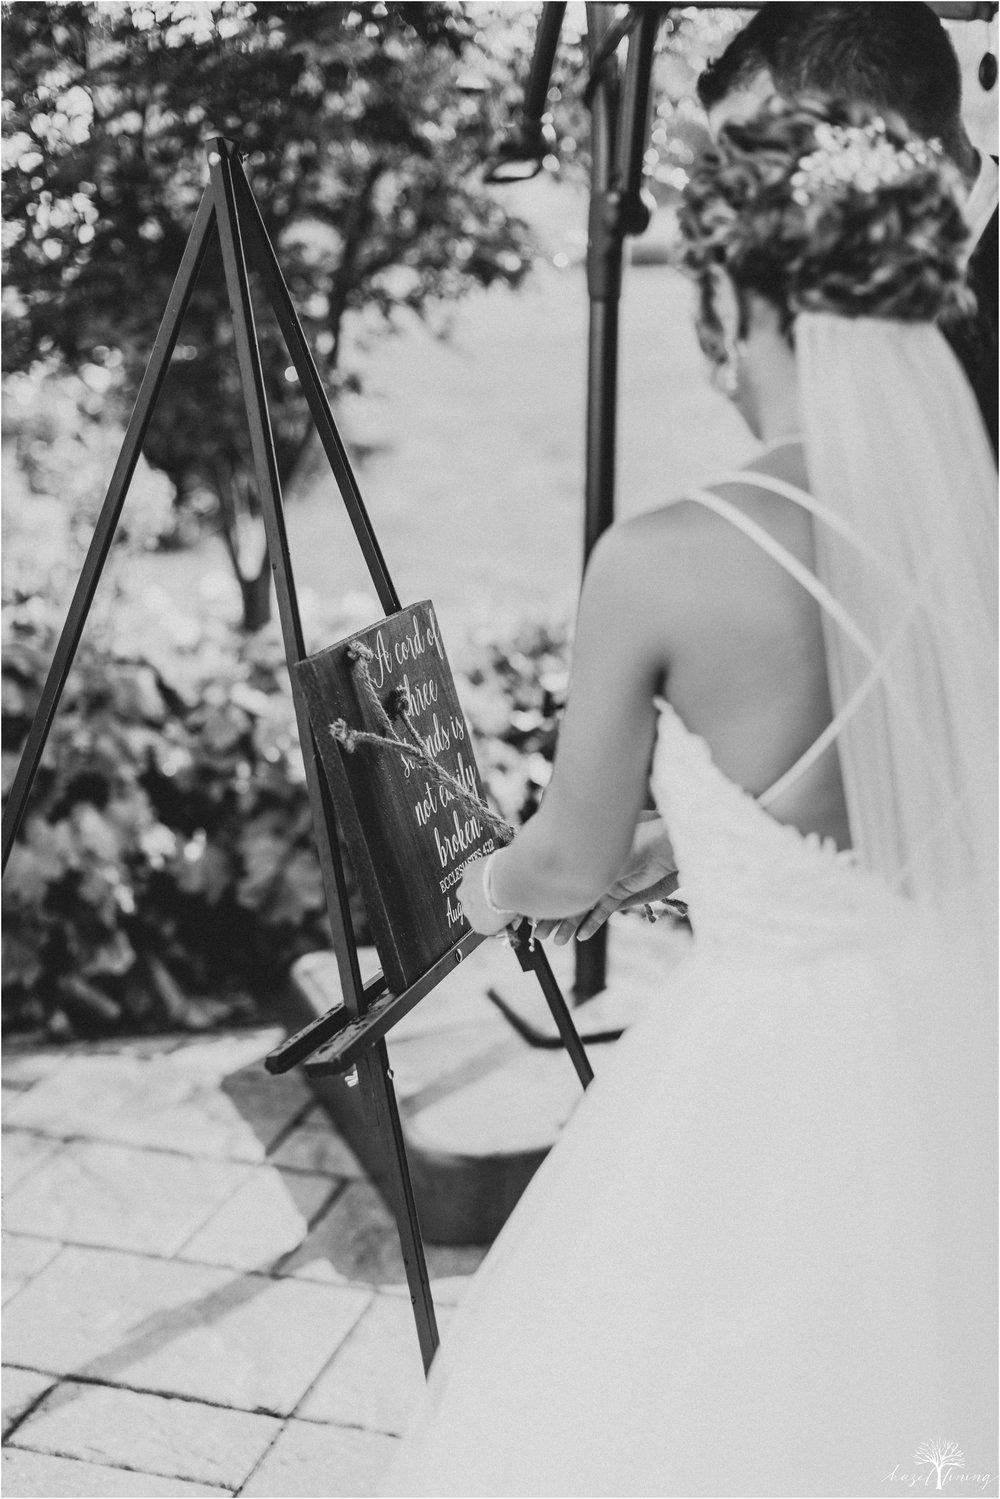 jonathan-weibel-becky-haywood-loft-at-sweetwater-cc-pennsburg-pennsylvania-rainy-day-summer-wedding-hazel-lining-travel-wedding-elopement-photography_0051.jpg